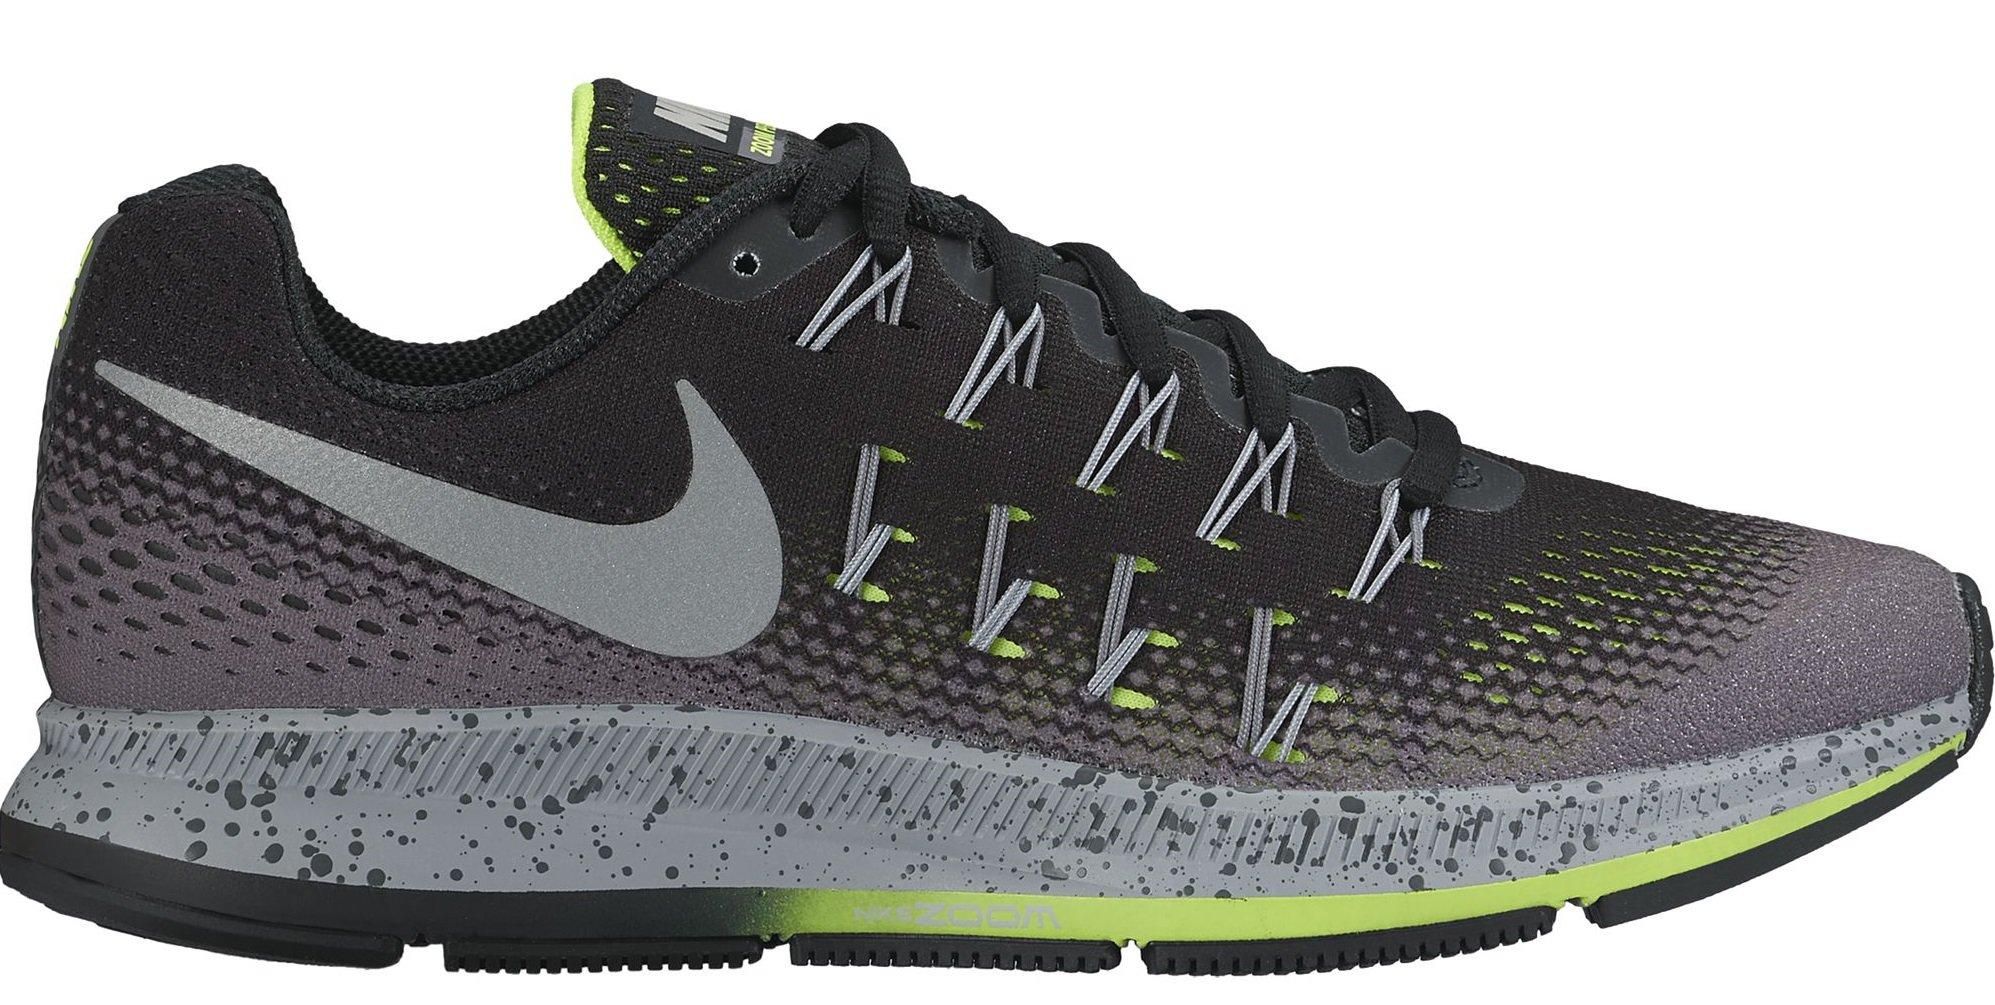 fd8cb640 Купить женские кроссовки Nike Air Zoom Pegasus 33 Shield W ...